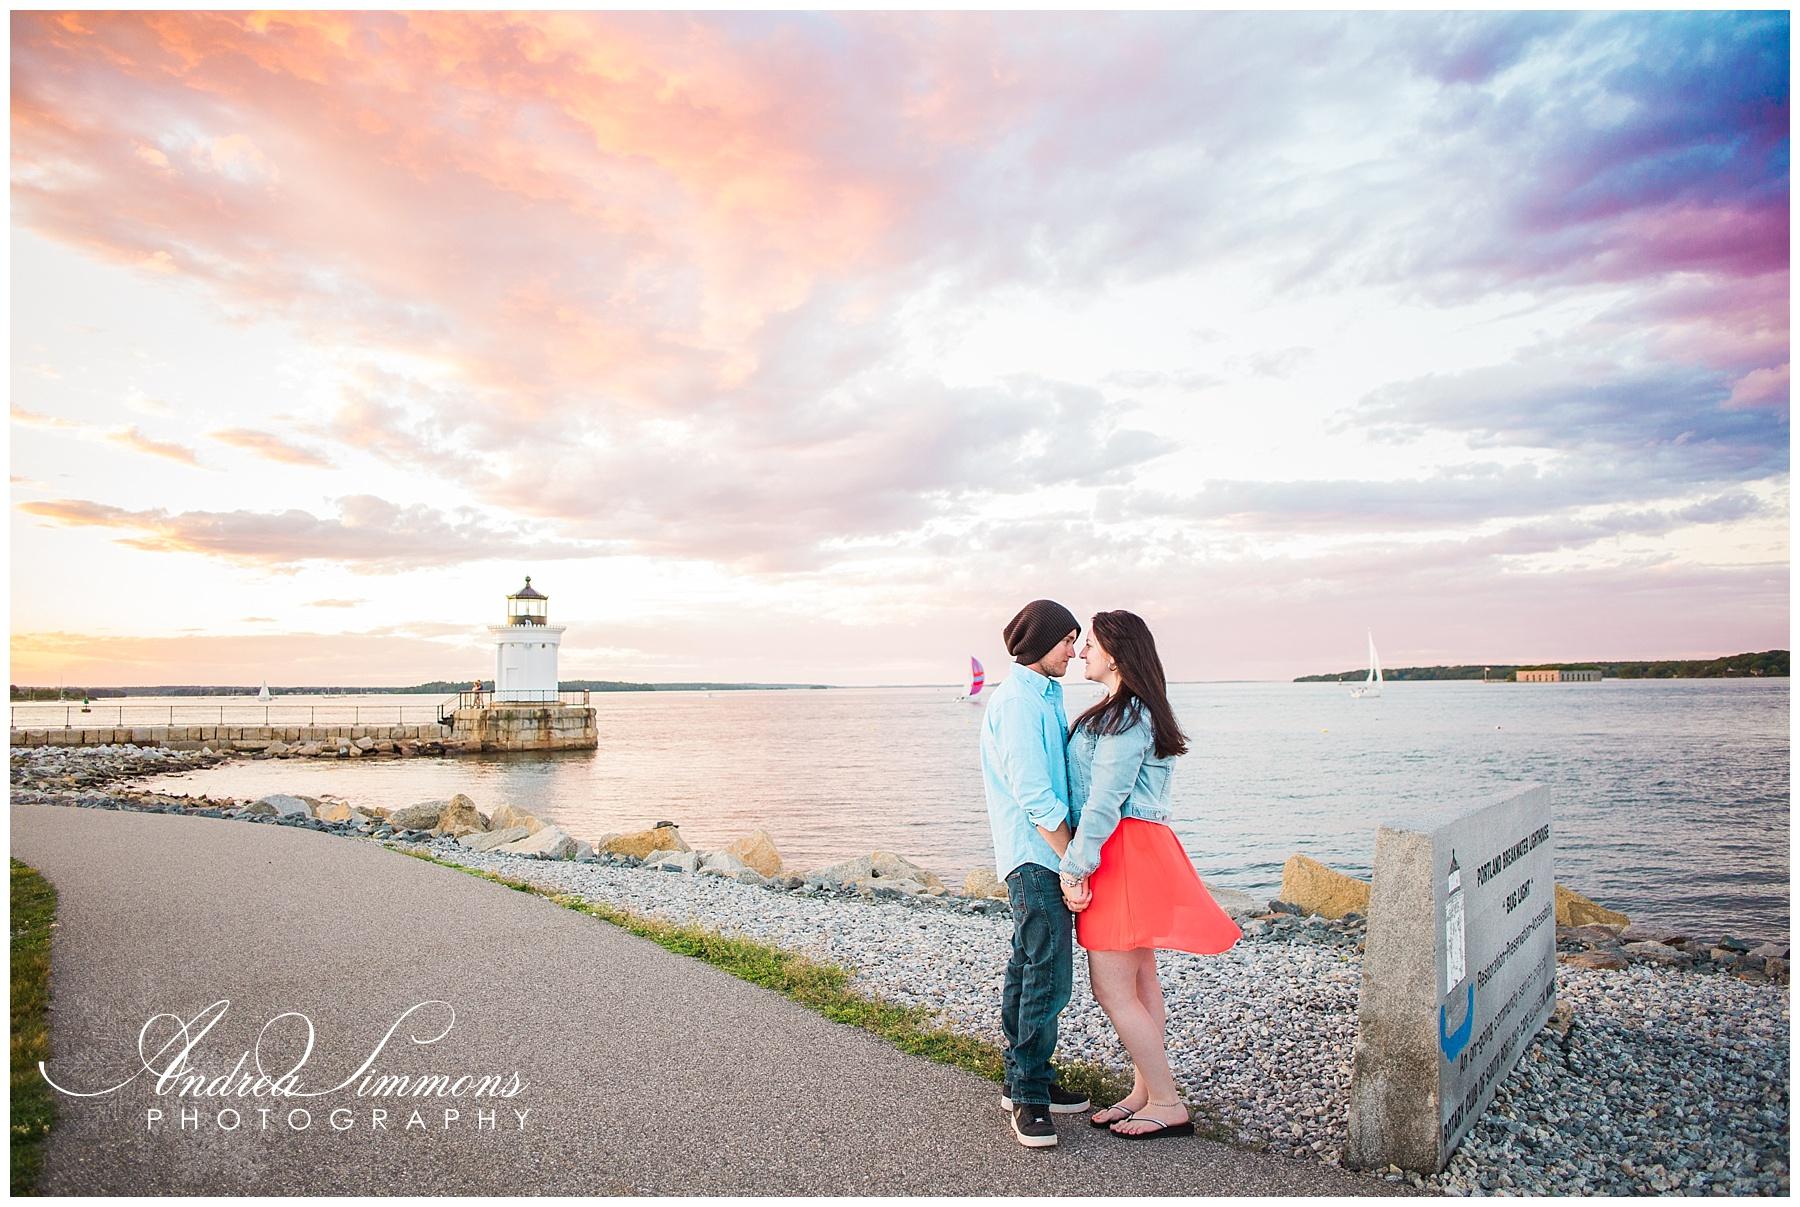 Maine engagement and wedding photographer